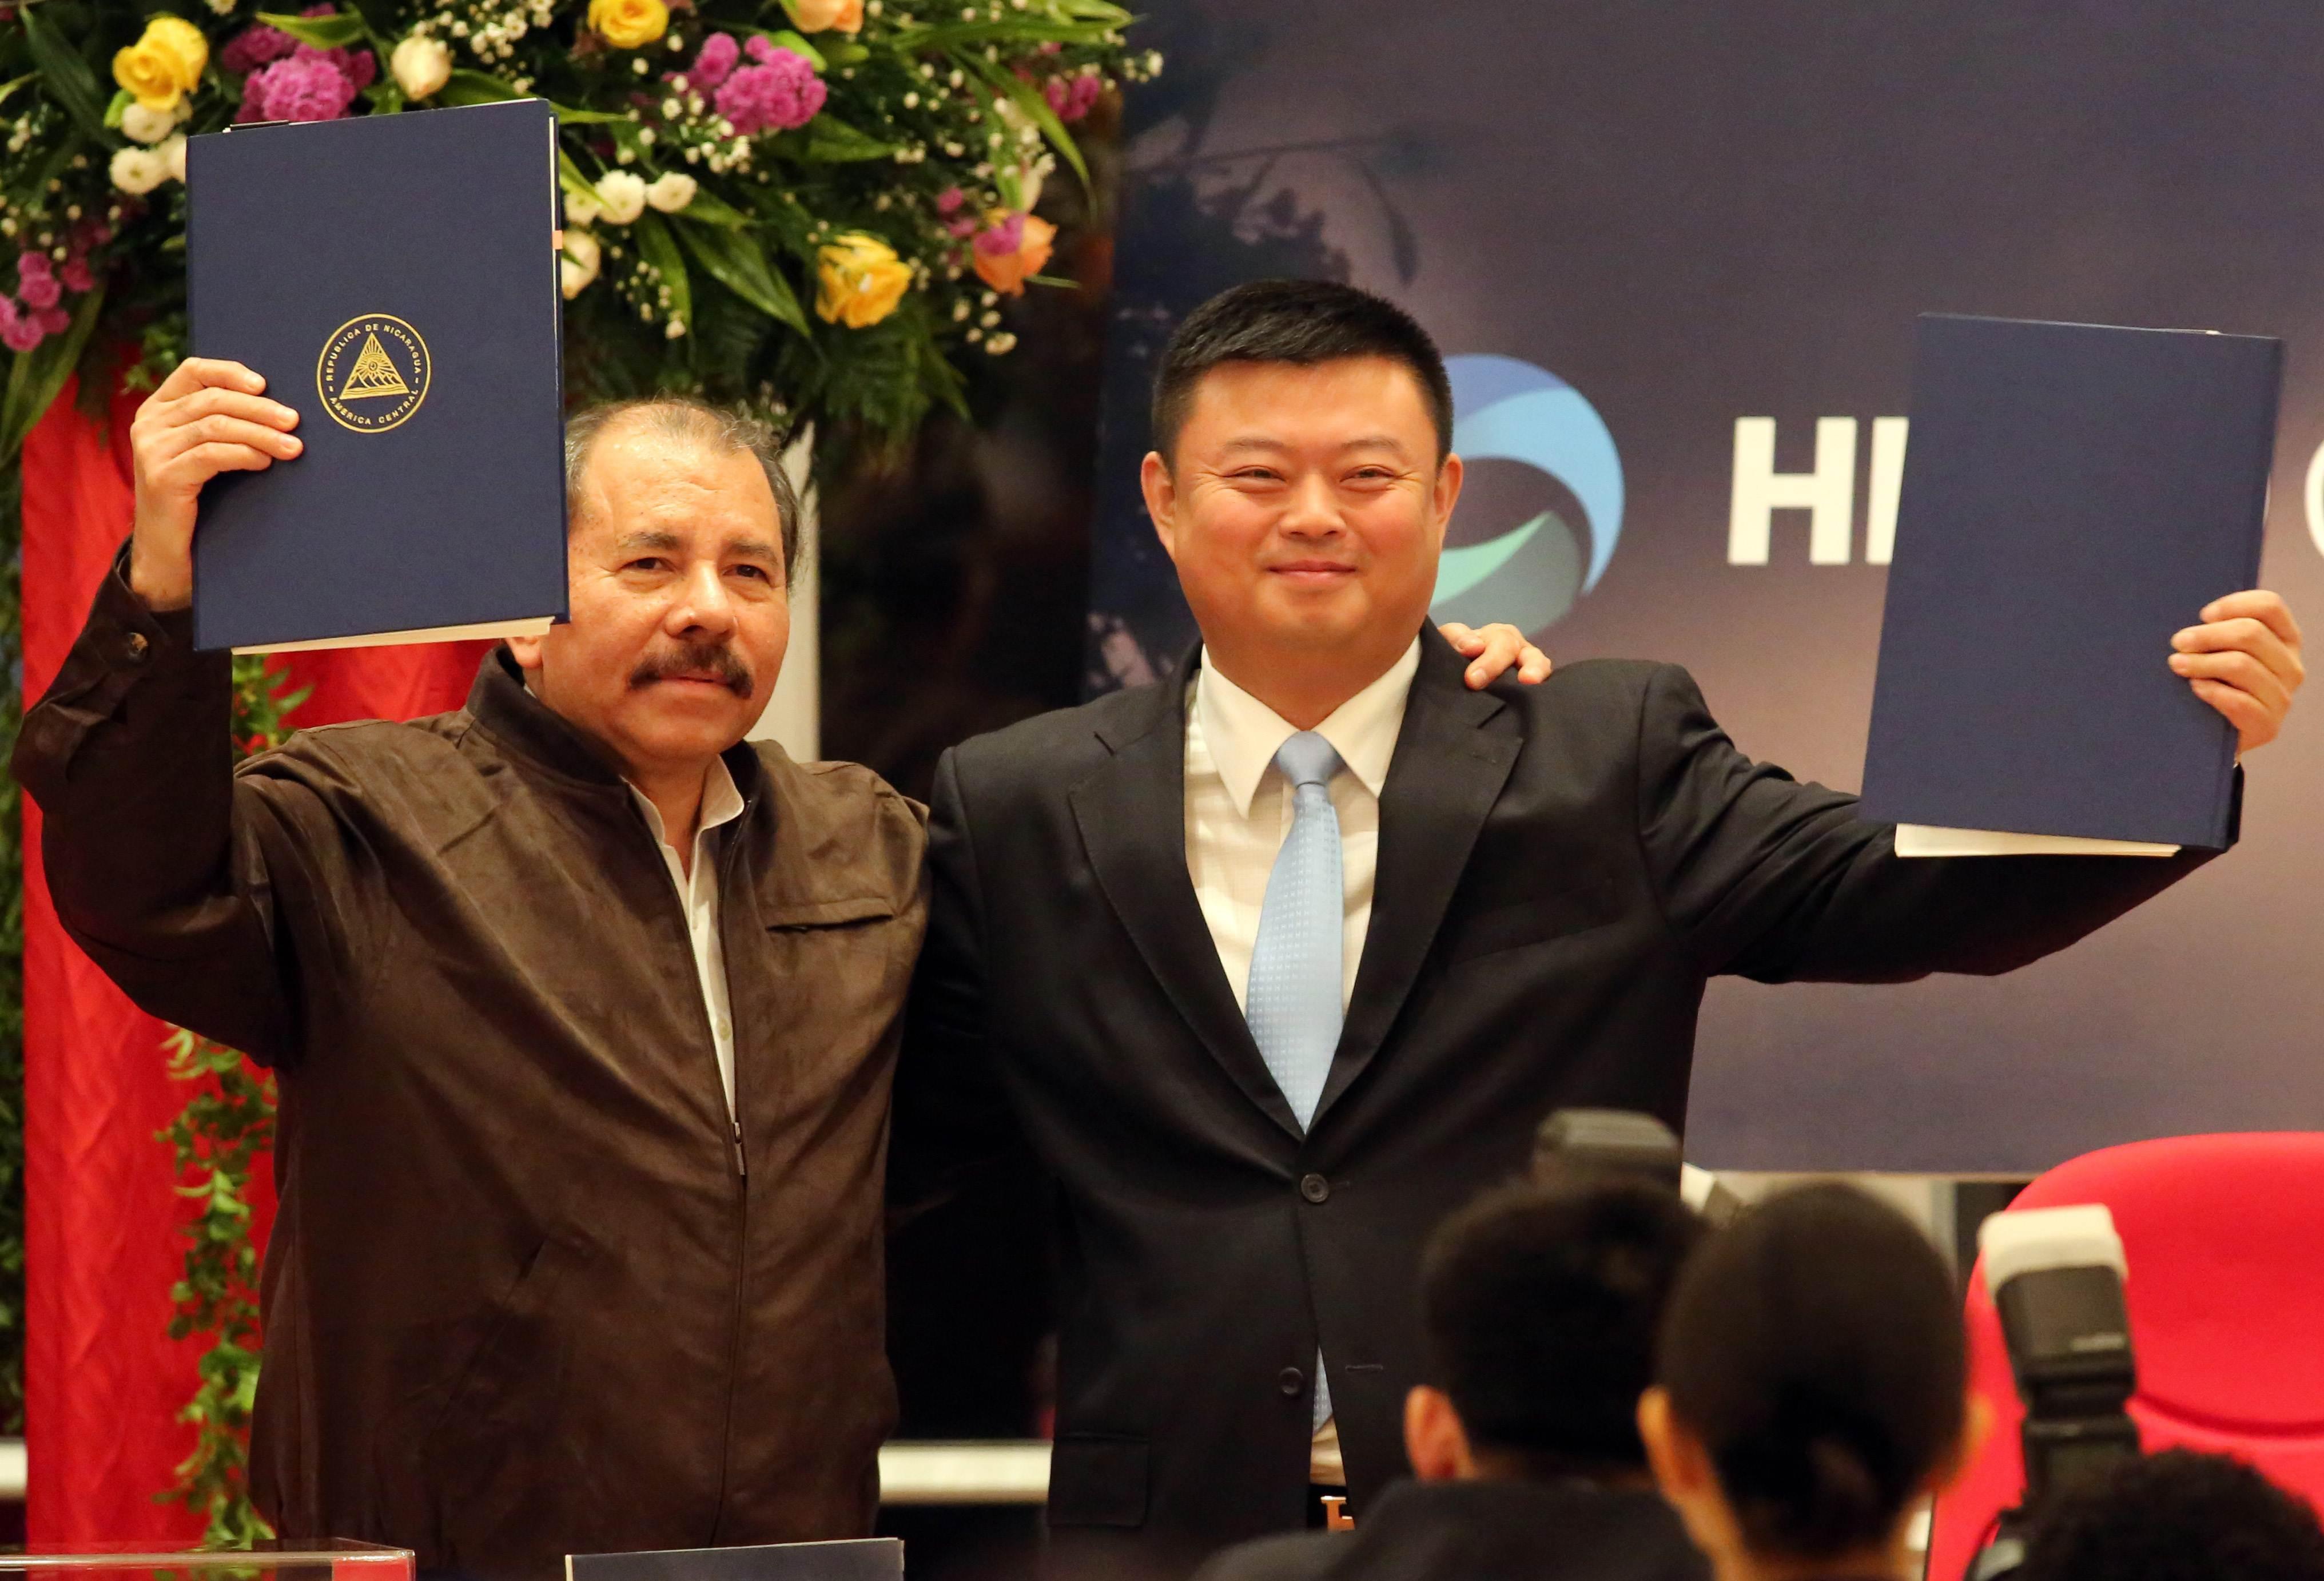 https://www.scmp.com/sites/default/files/2013/07/04/nicaragua-china-canal_pan121_36394145.jpg